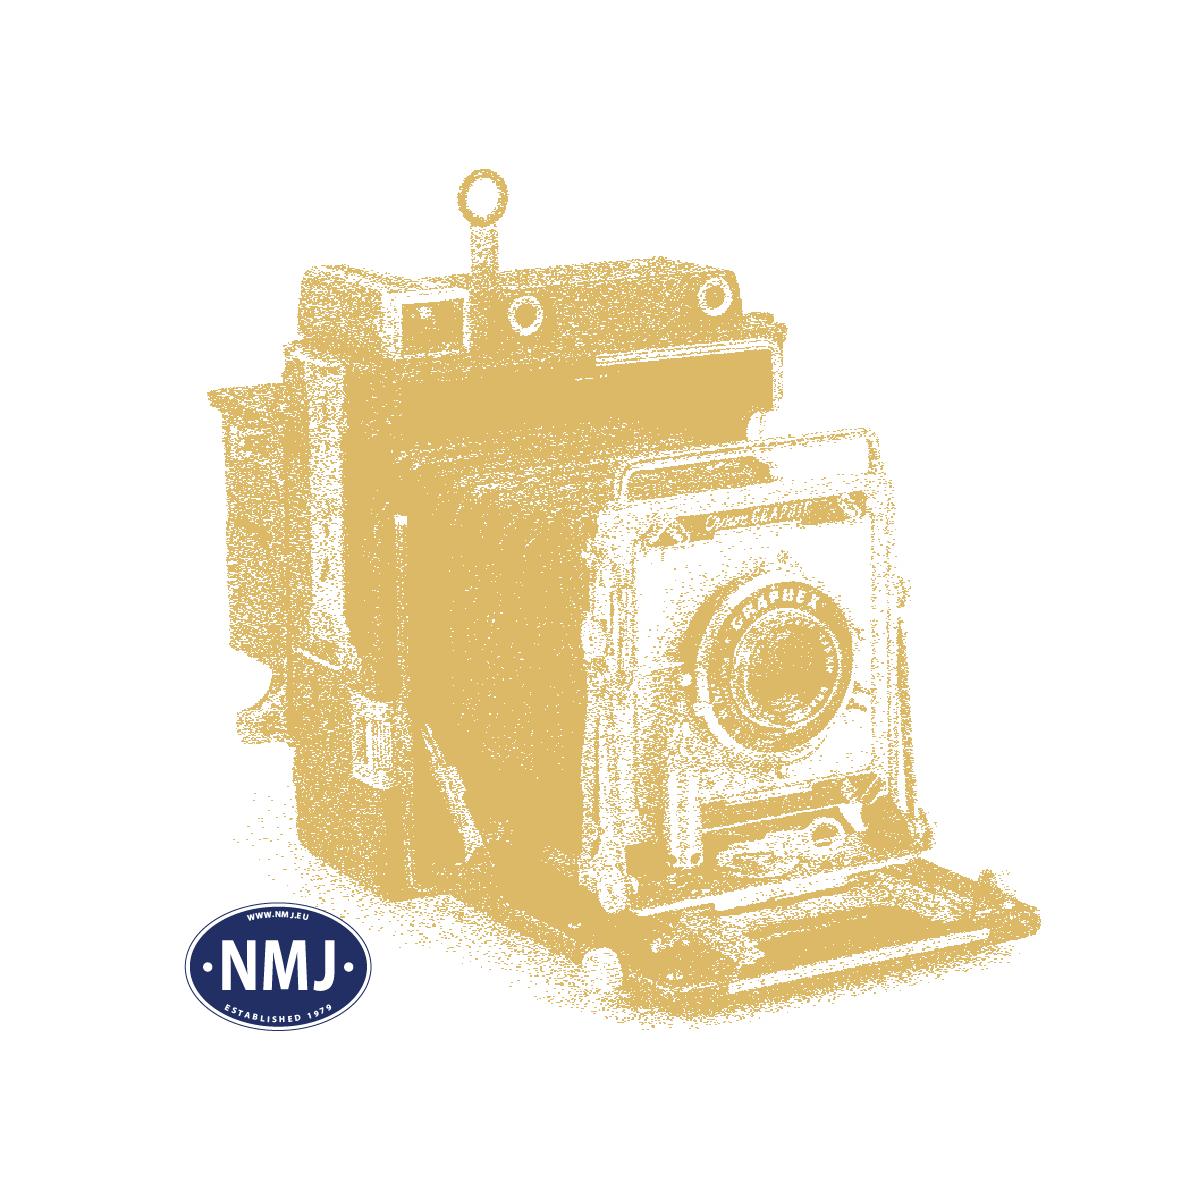 NMJT90302 - NMJ Topline CLF 1603 (1956-1971), DCC mit Sound